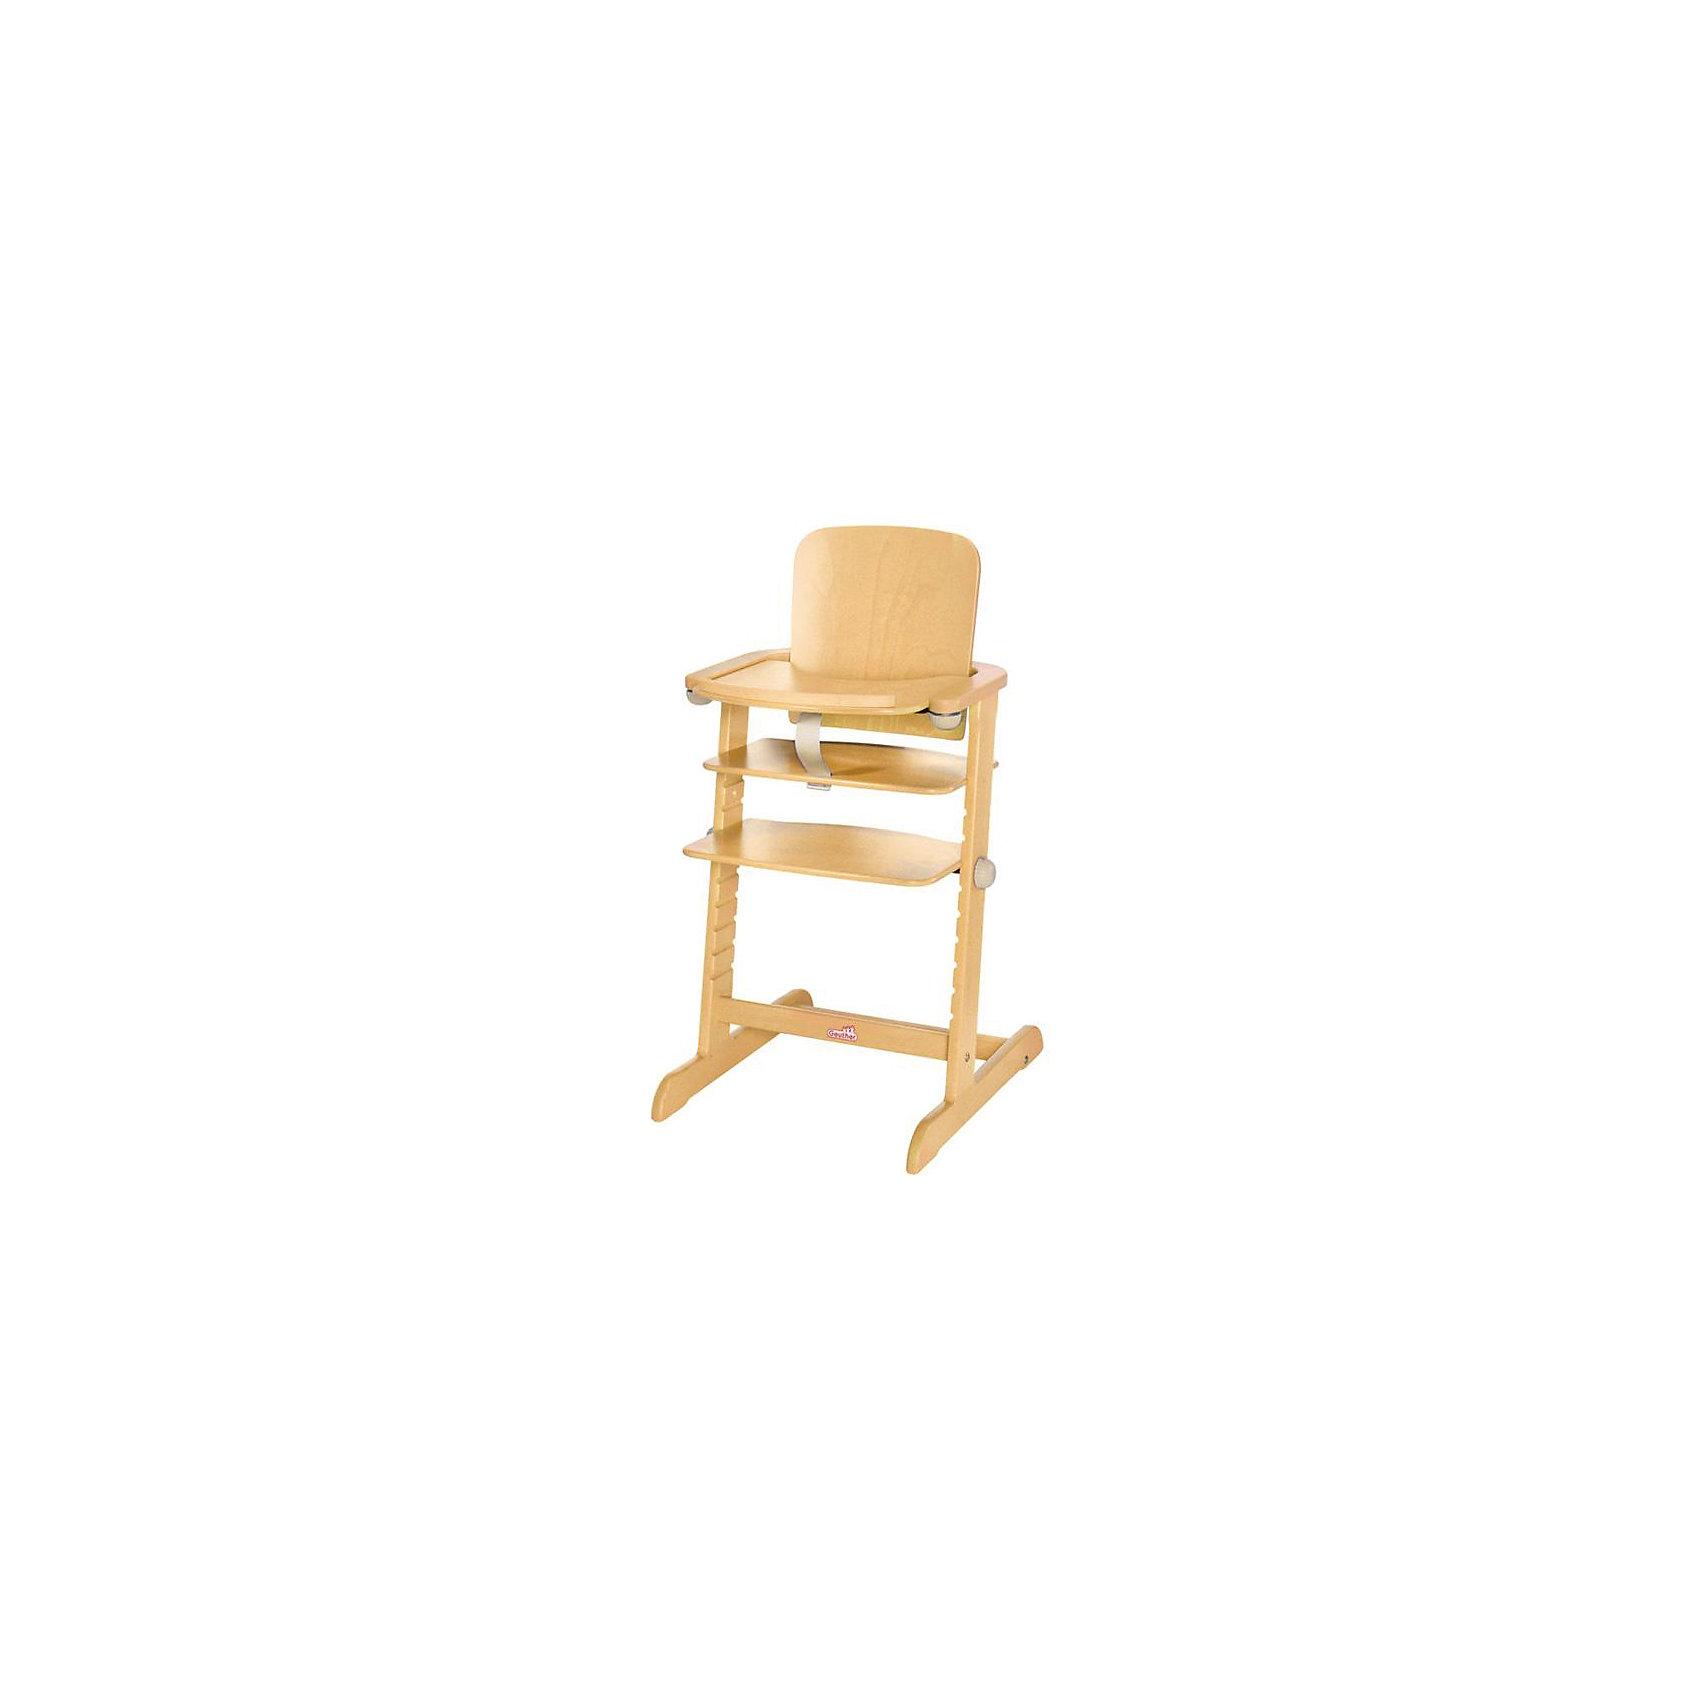 Geuther Стульчик для кормления FAMILY, Geuther, колониаль столик geuther столик для стульчика geuther syt